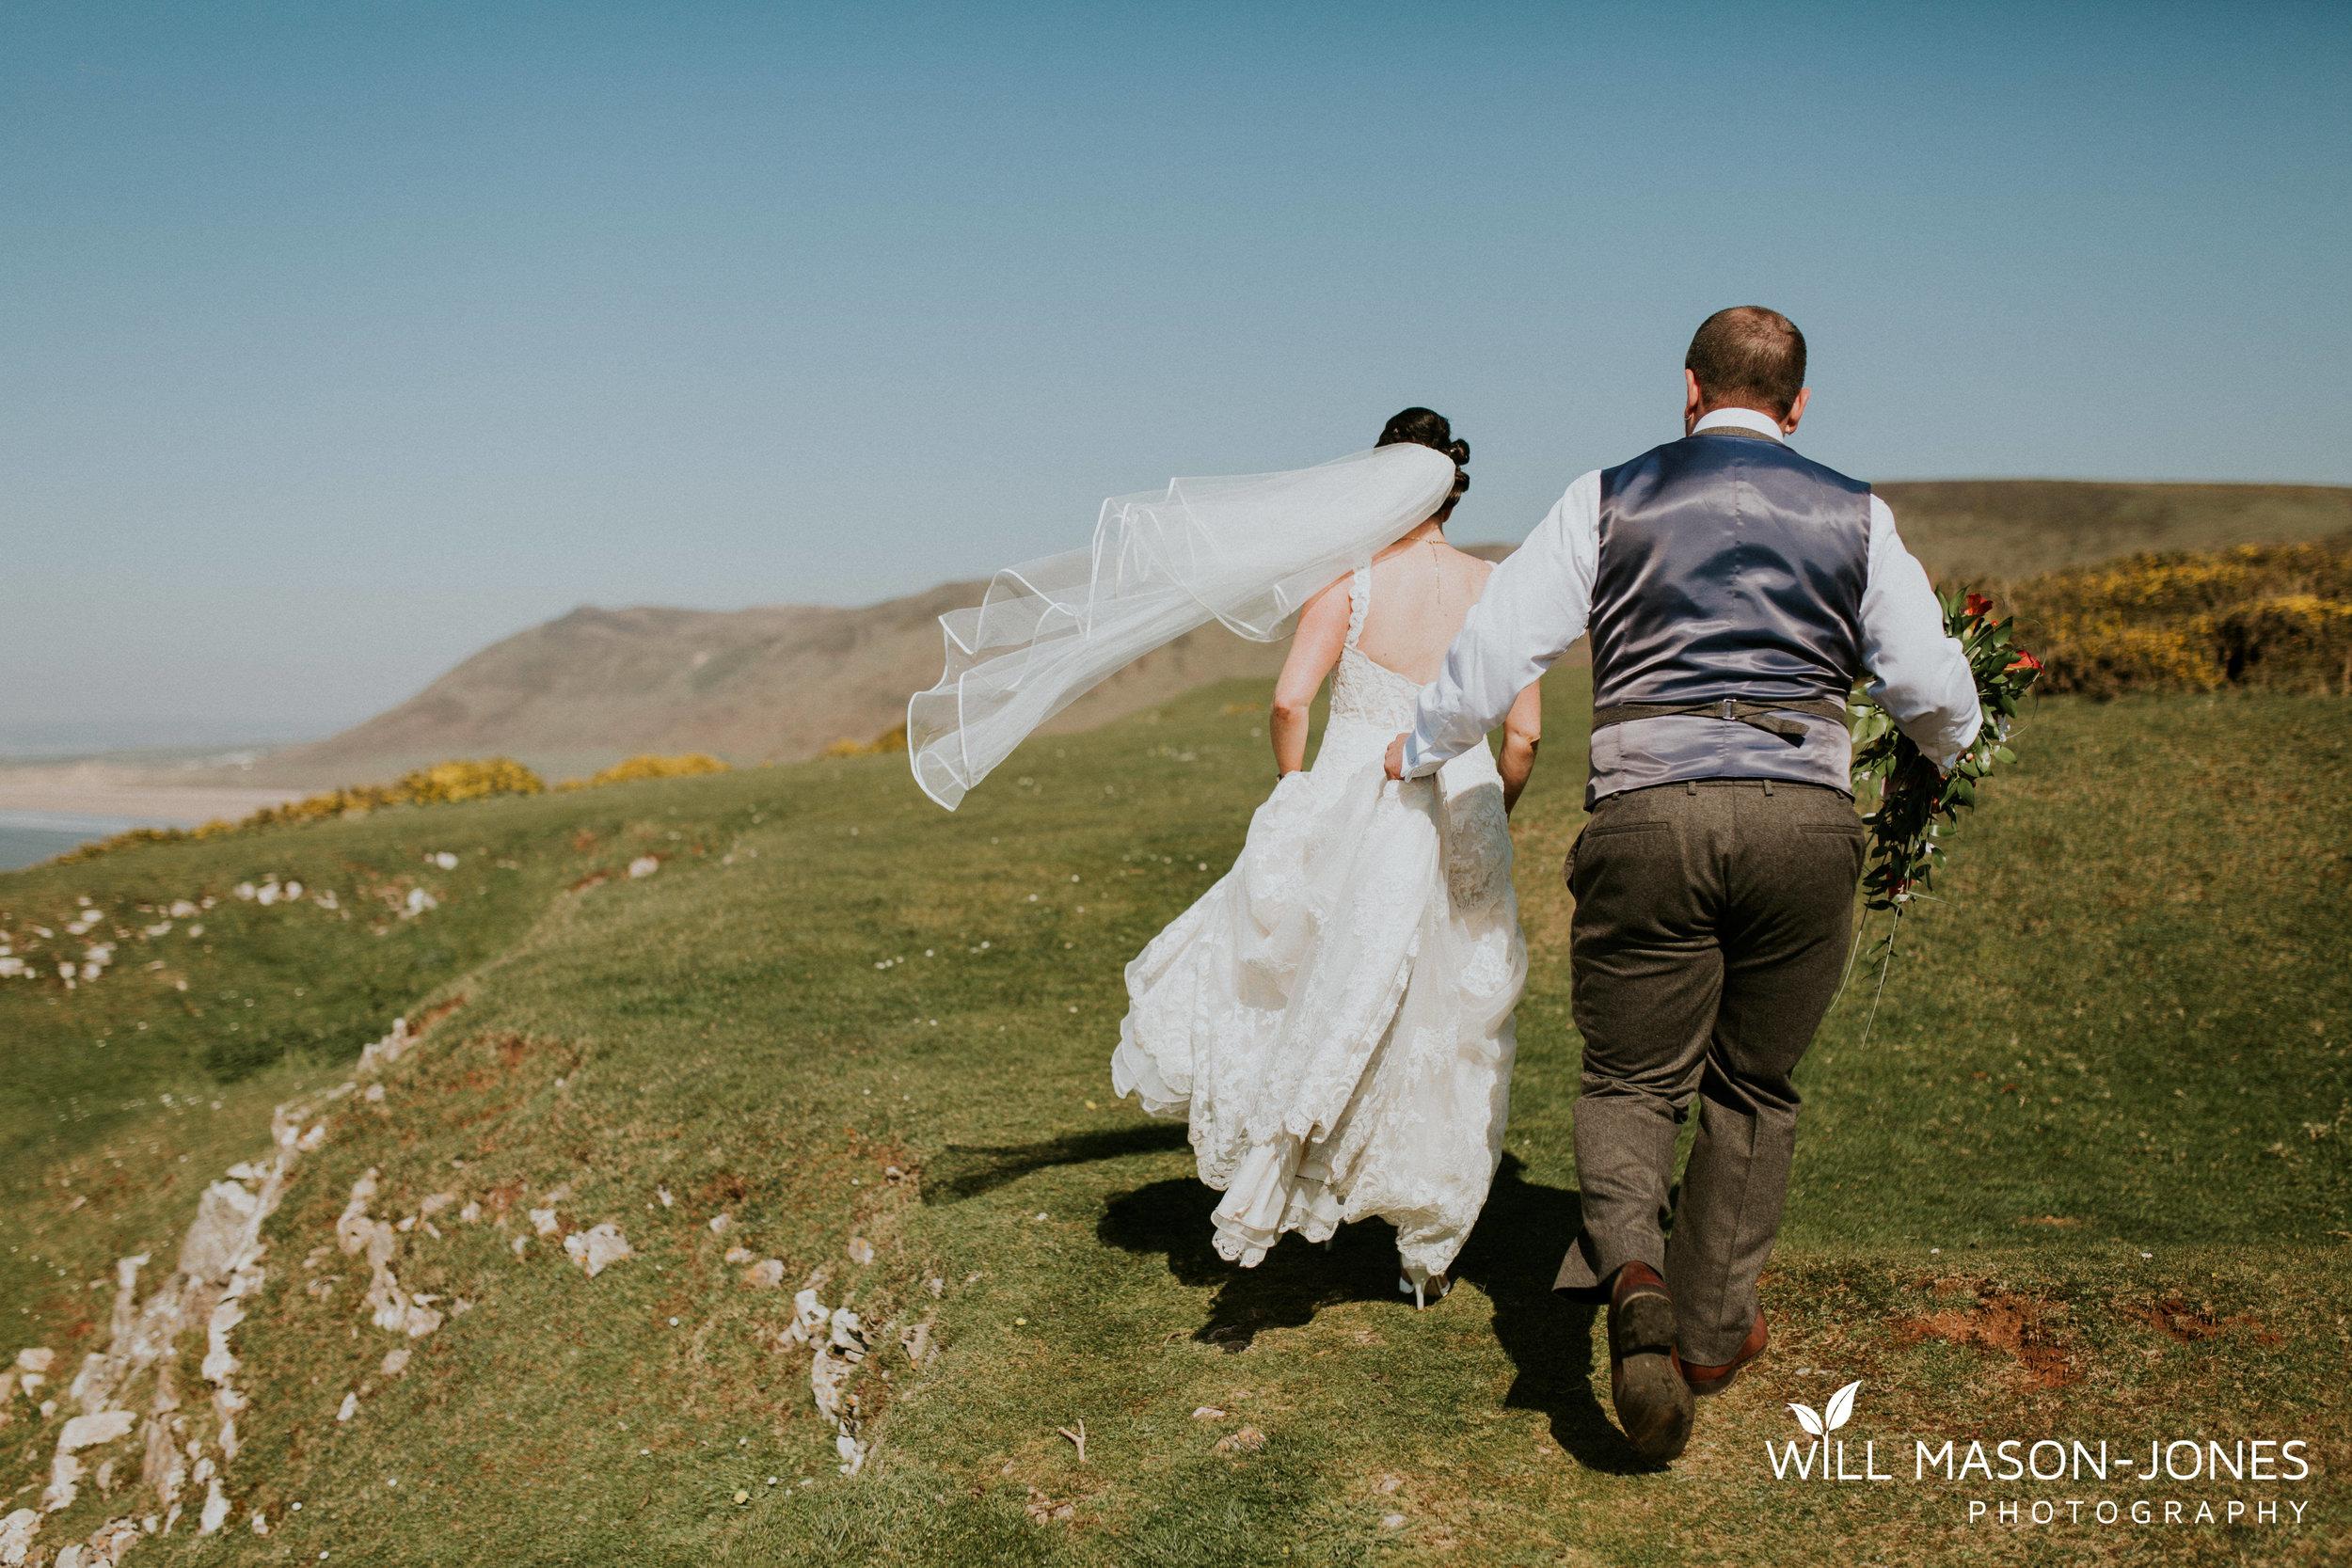 king arthur hotel gower swansea wedding photographer rhossili cliffs